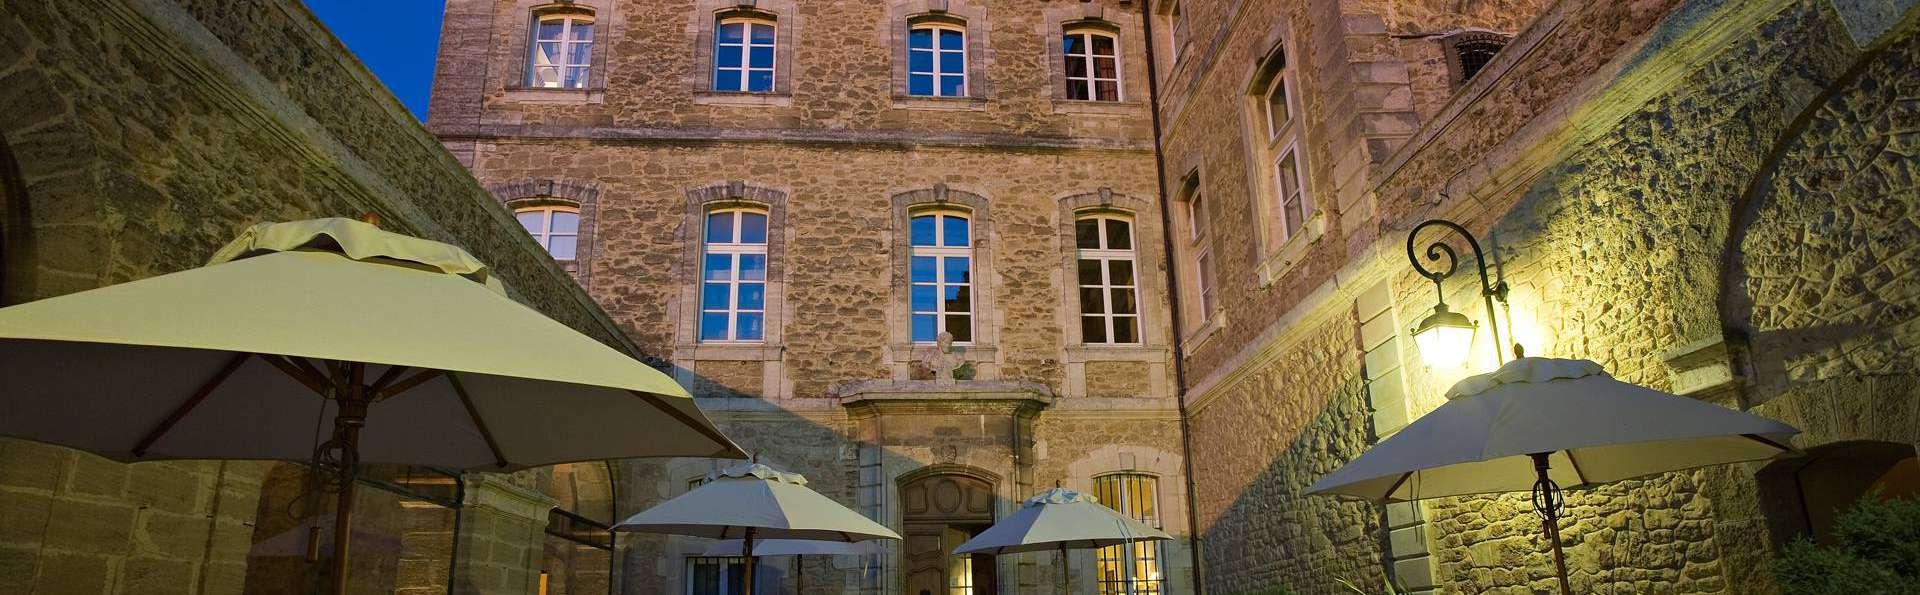 Château de Rochegude - edit_terrace02.jpeg